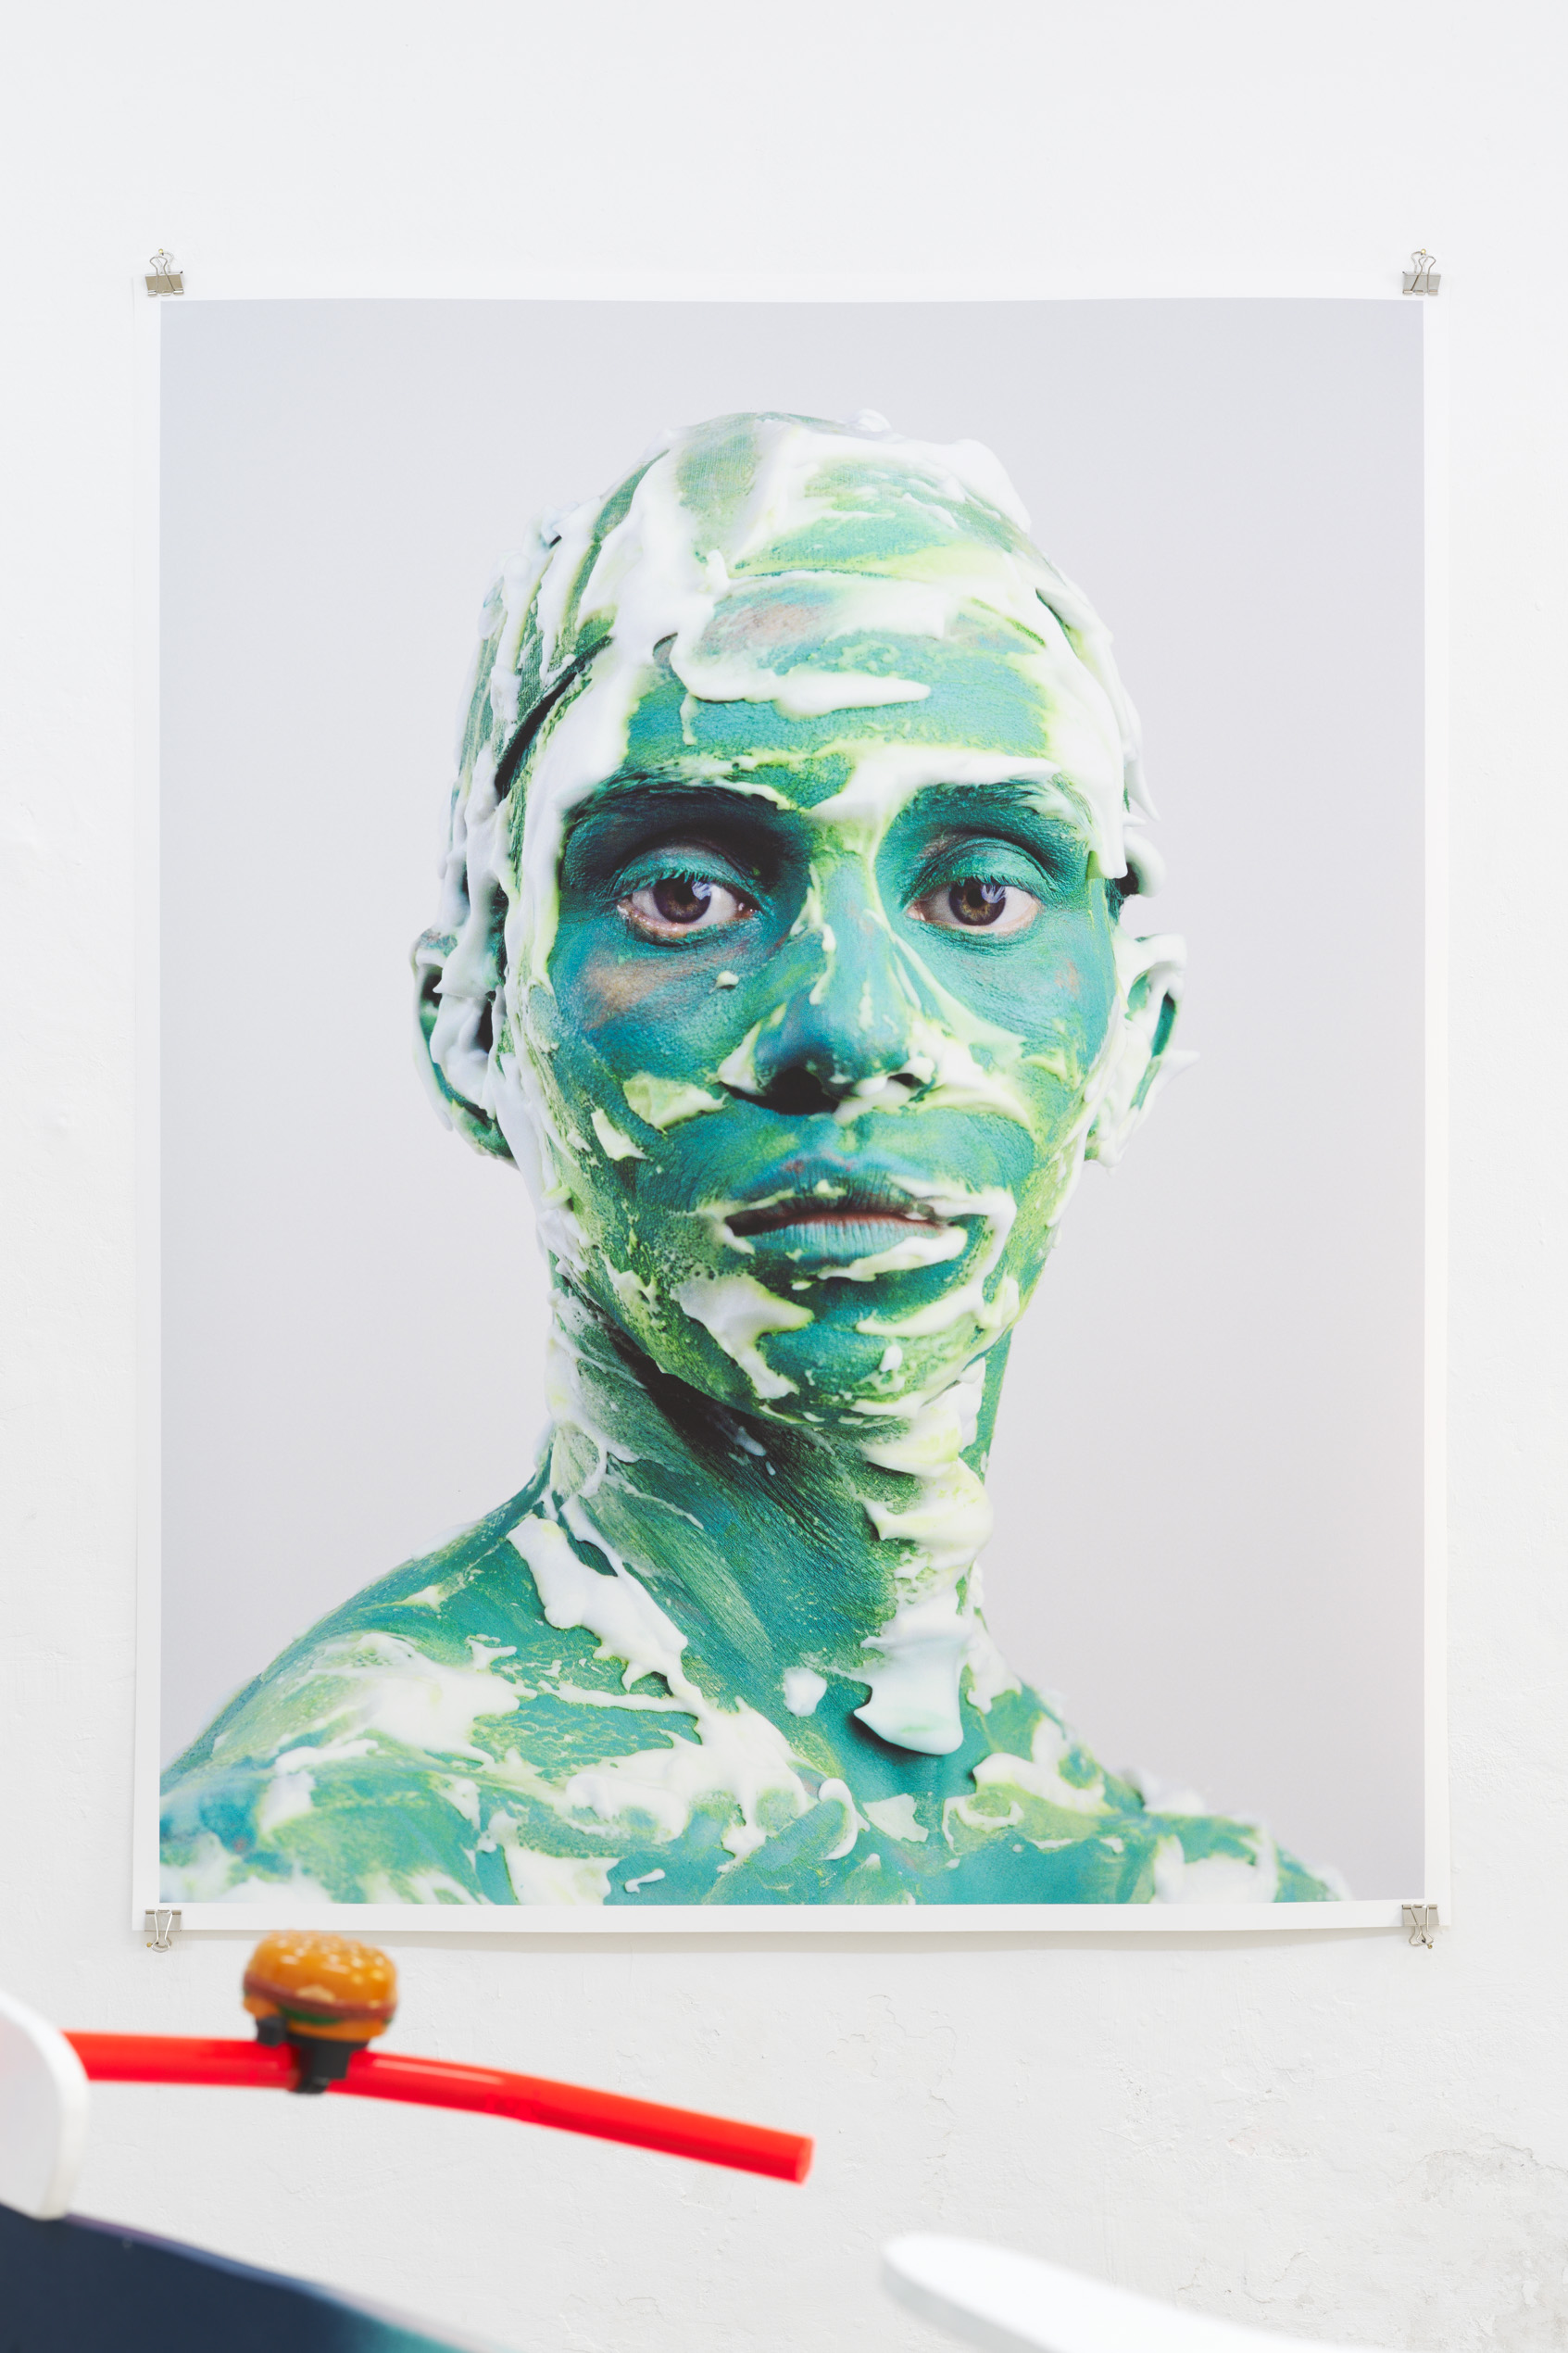 Alex De Brabant, Head #09 (Untitled), Inkjet Print on Hahnemühle Photo Rag, 150 x 120 cm